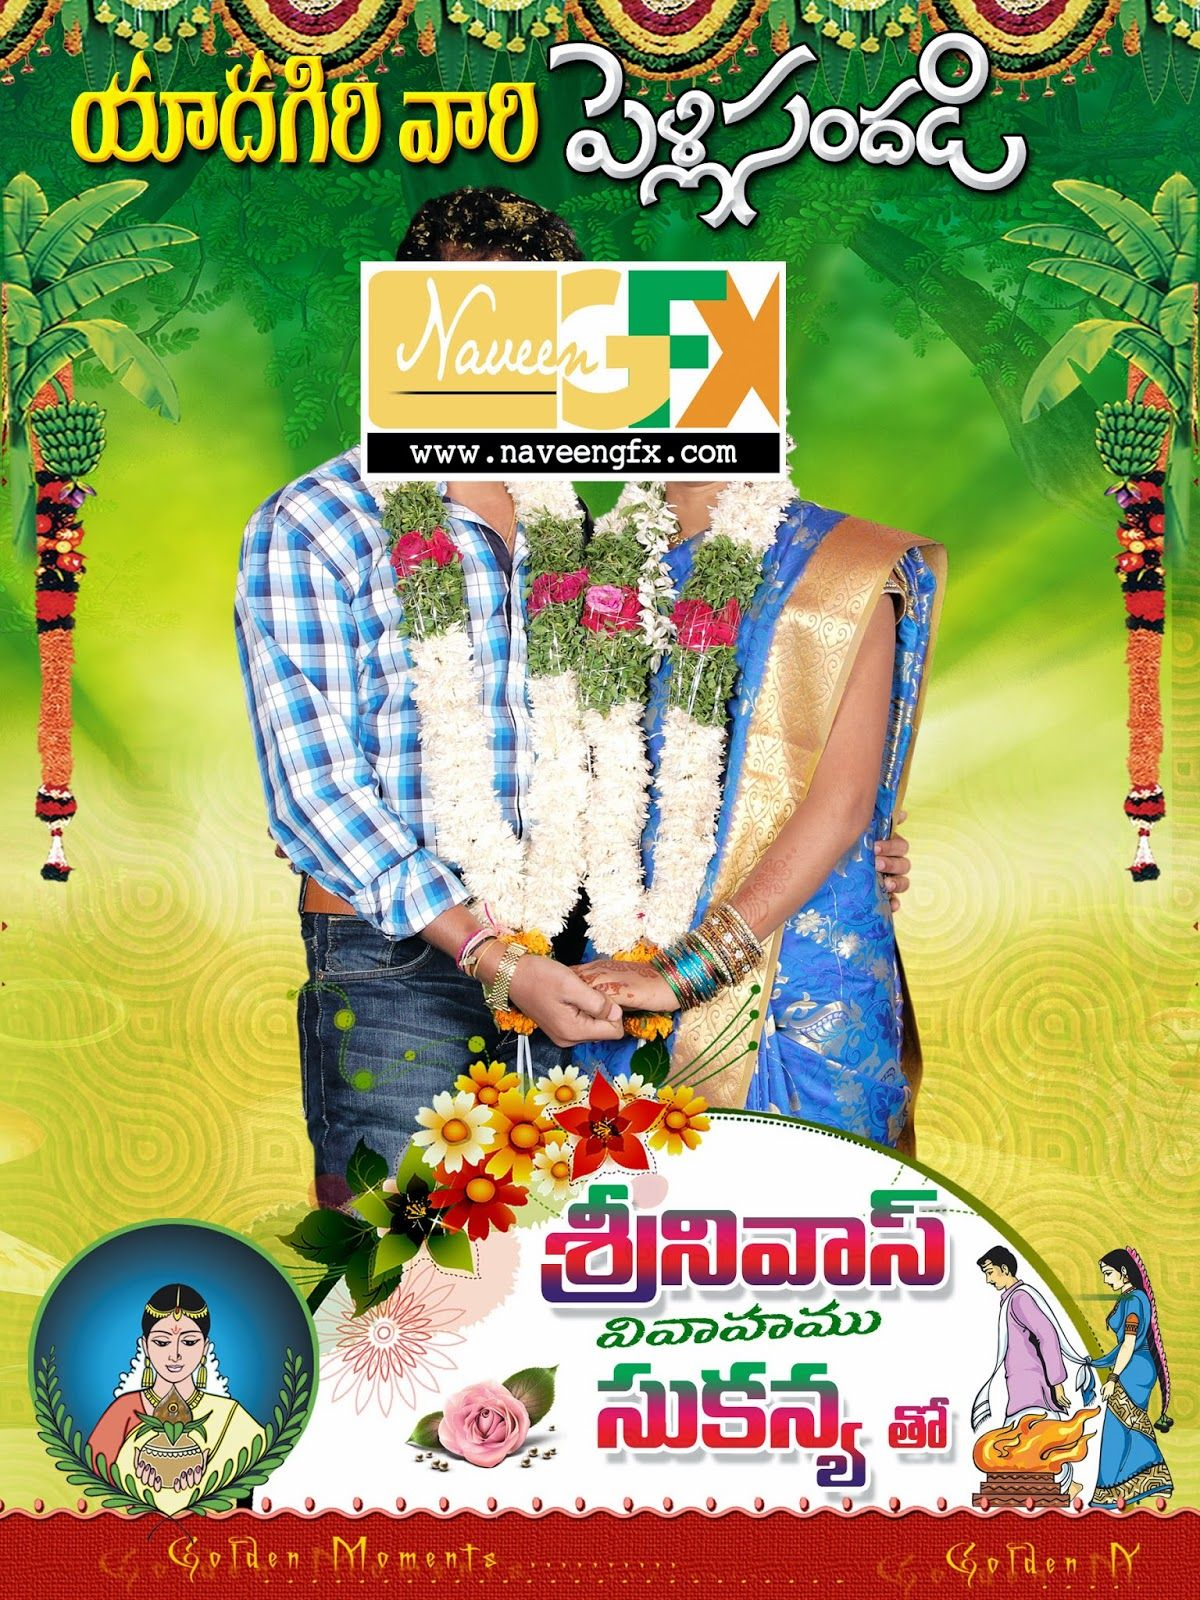 Marriage Banner Design Templates In Marathi Tutalo